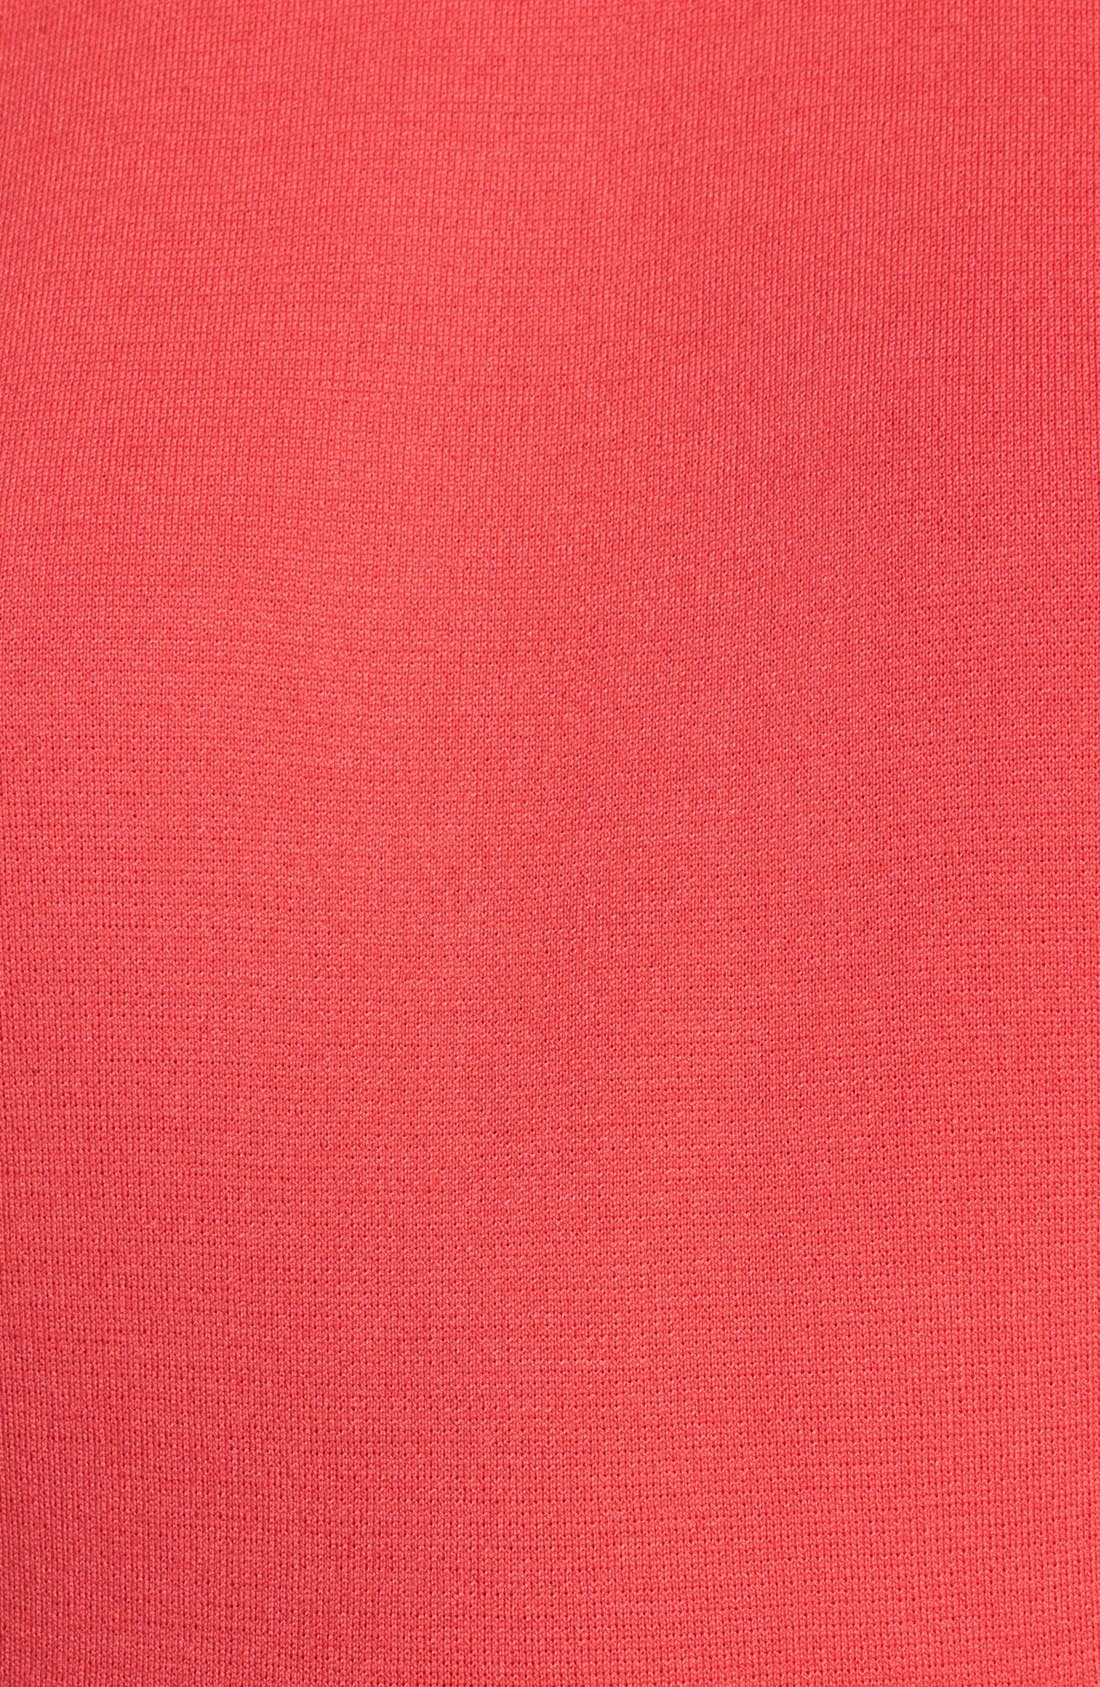 Alternate Image 5  - St. John Collection Cap Sleeve Milano Knit Peplum Top